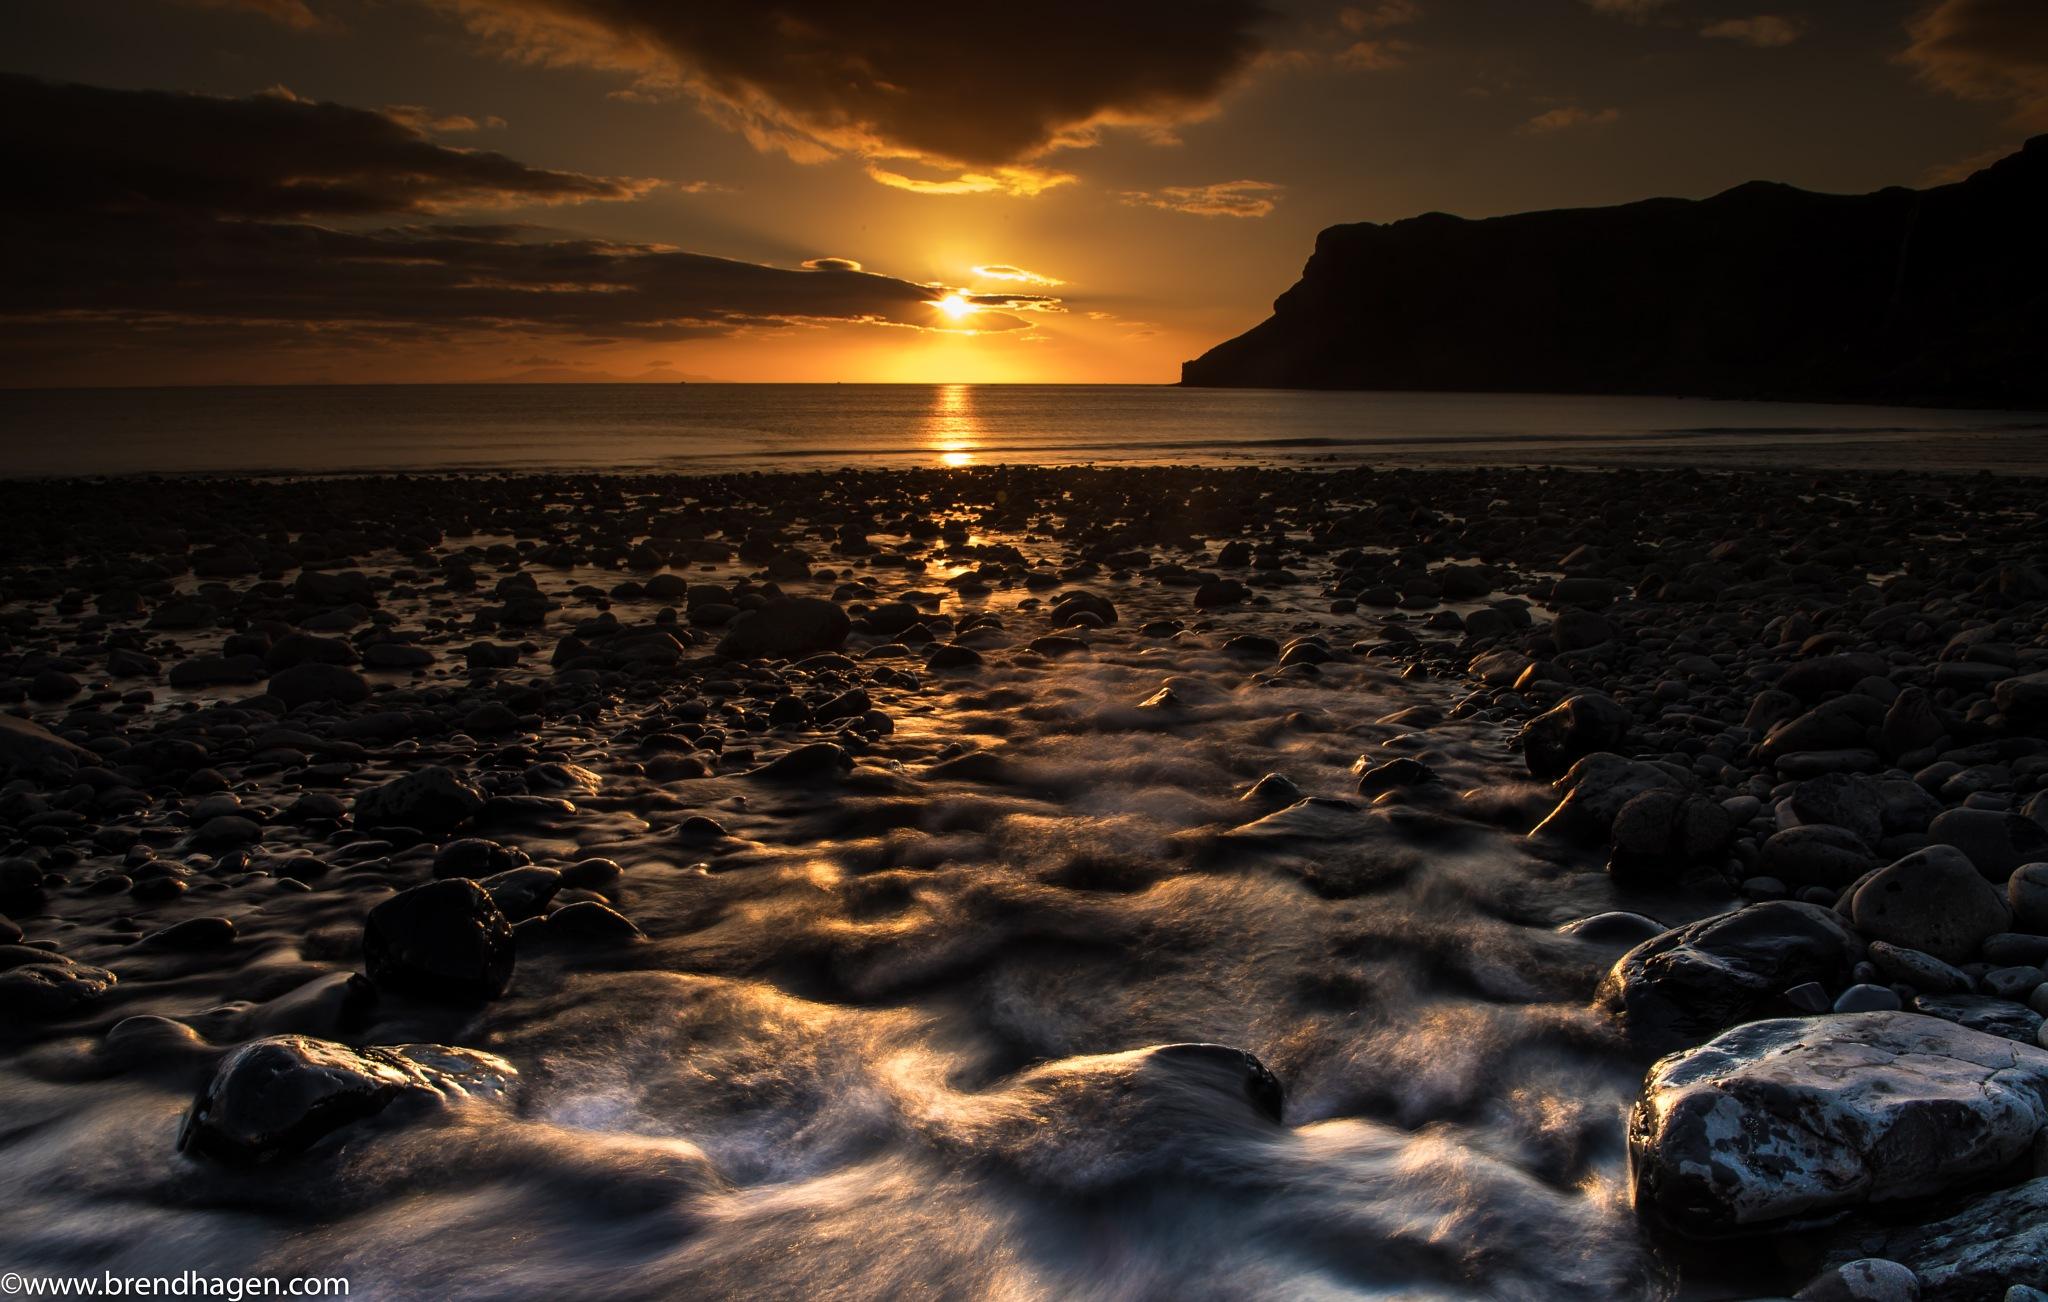 Sunset - Isle of Sky in Scotland by Roger Brendhagen